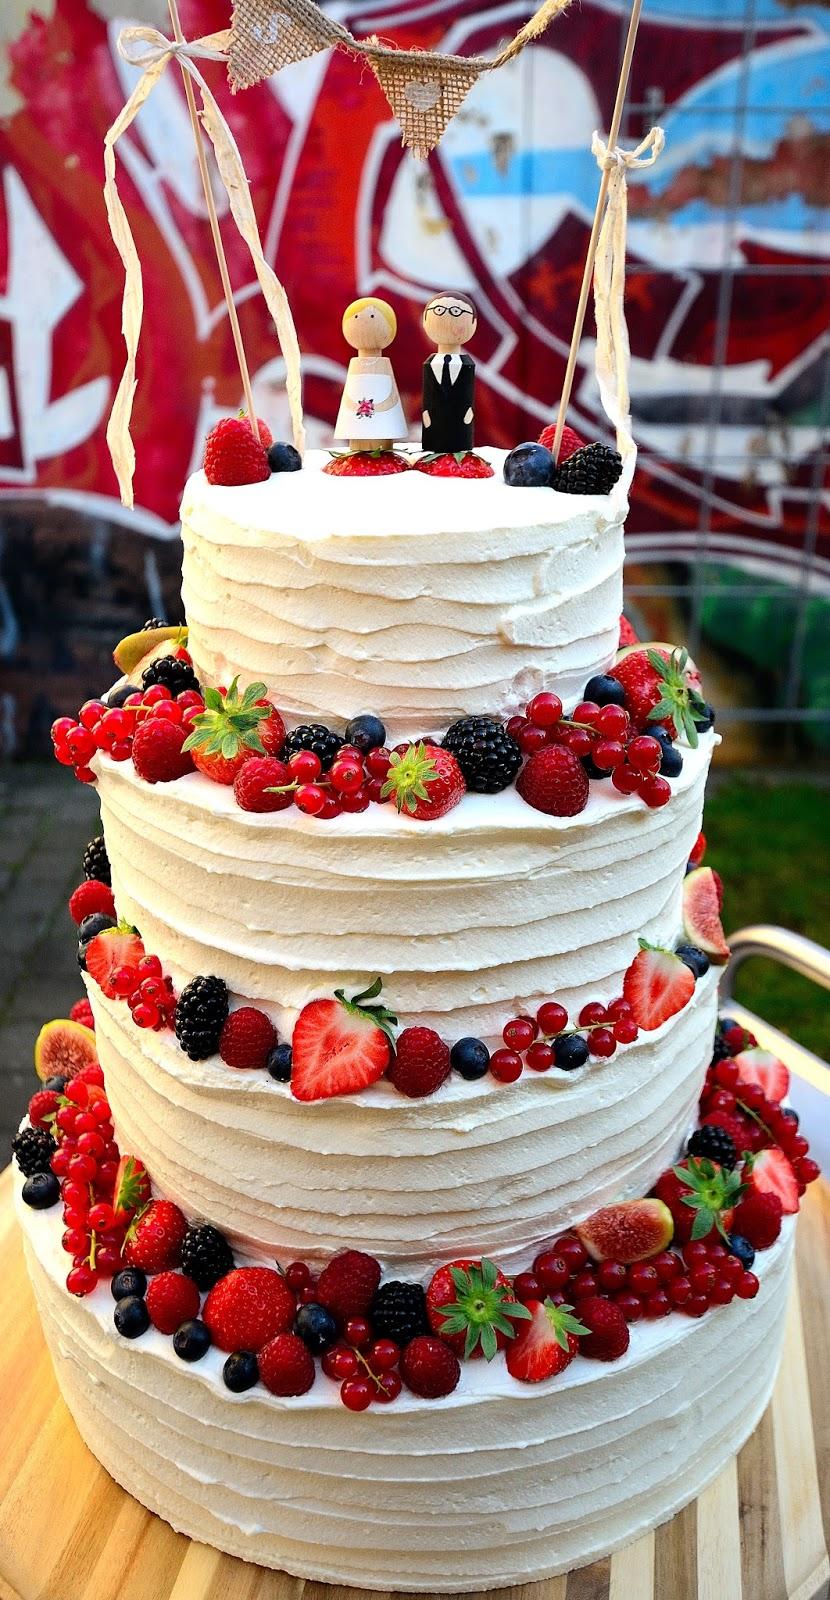 4 Stockige Hochzeitstorte Fur Sabrina Jorg Bakerydoings